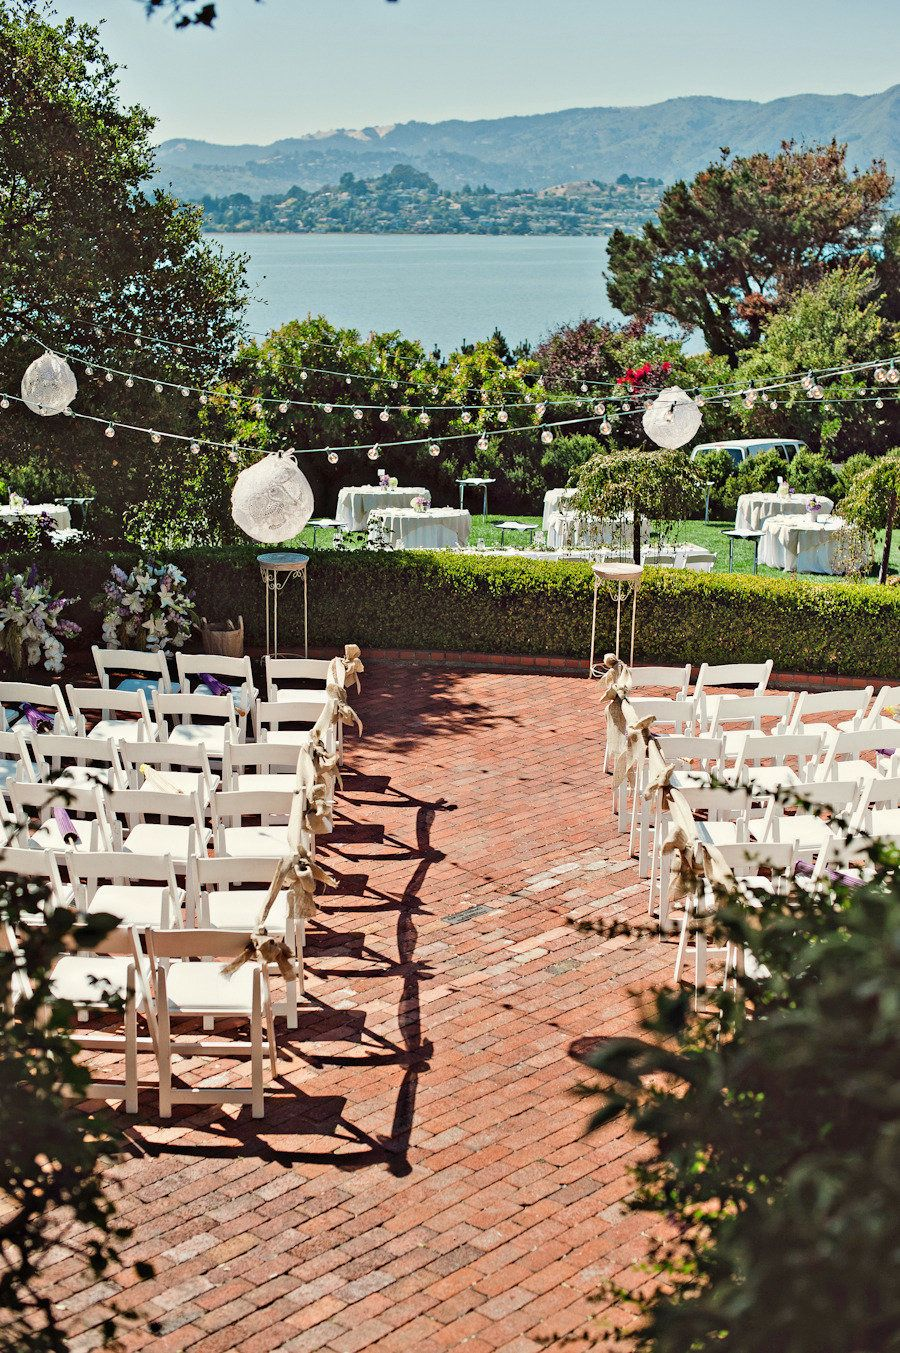 Bay Area Wedding At Landmark Art And Garden Center From Captured